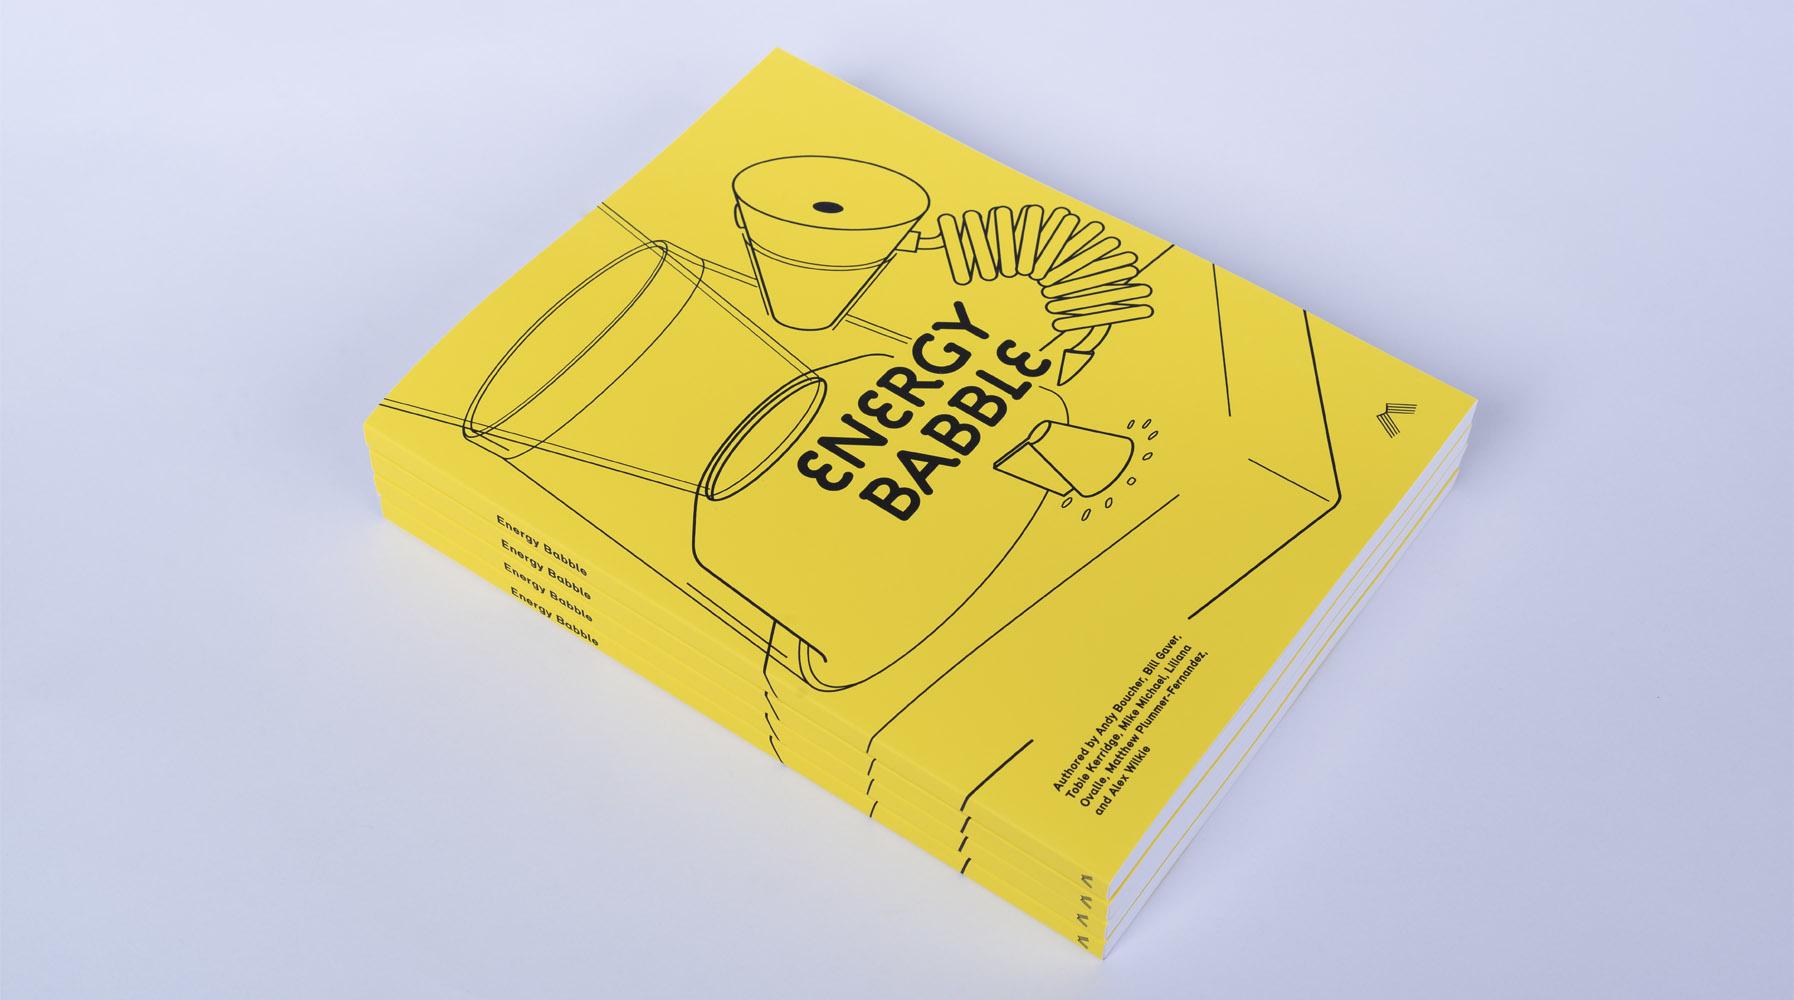 Energy Babble book